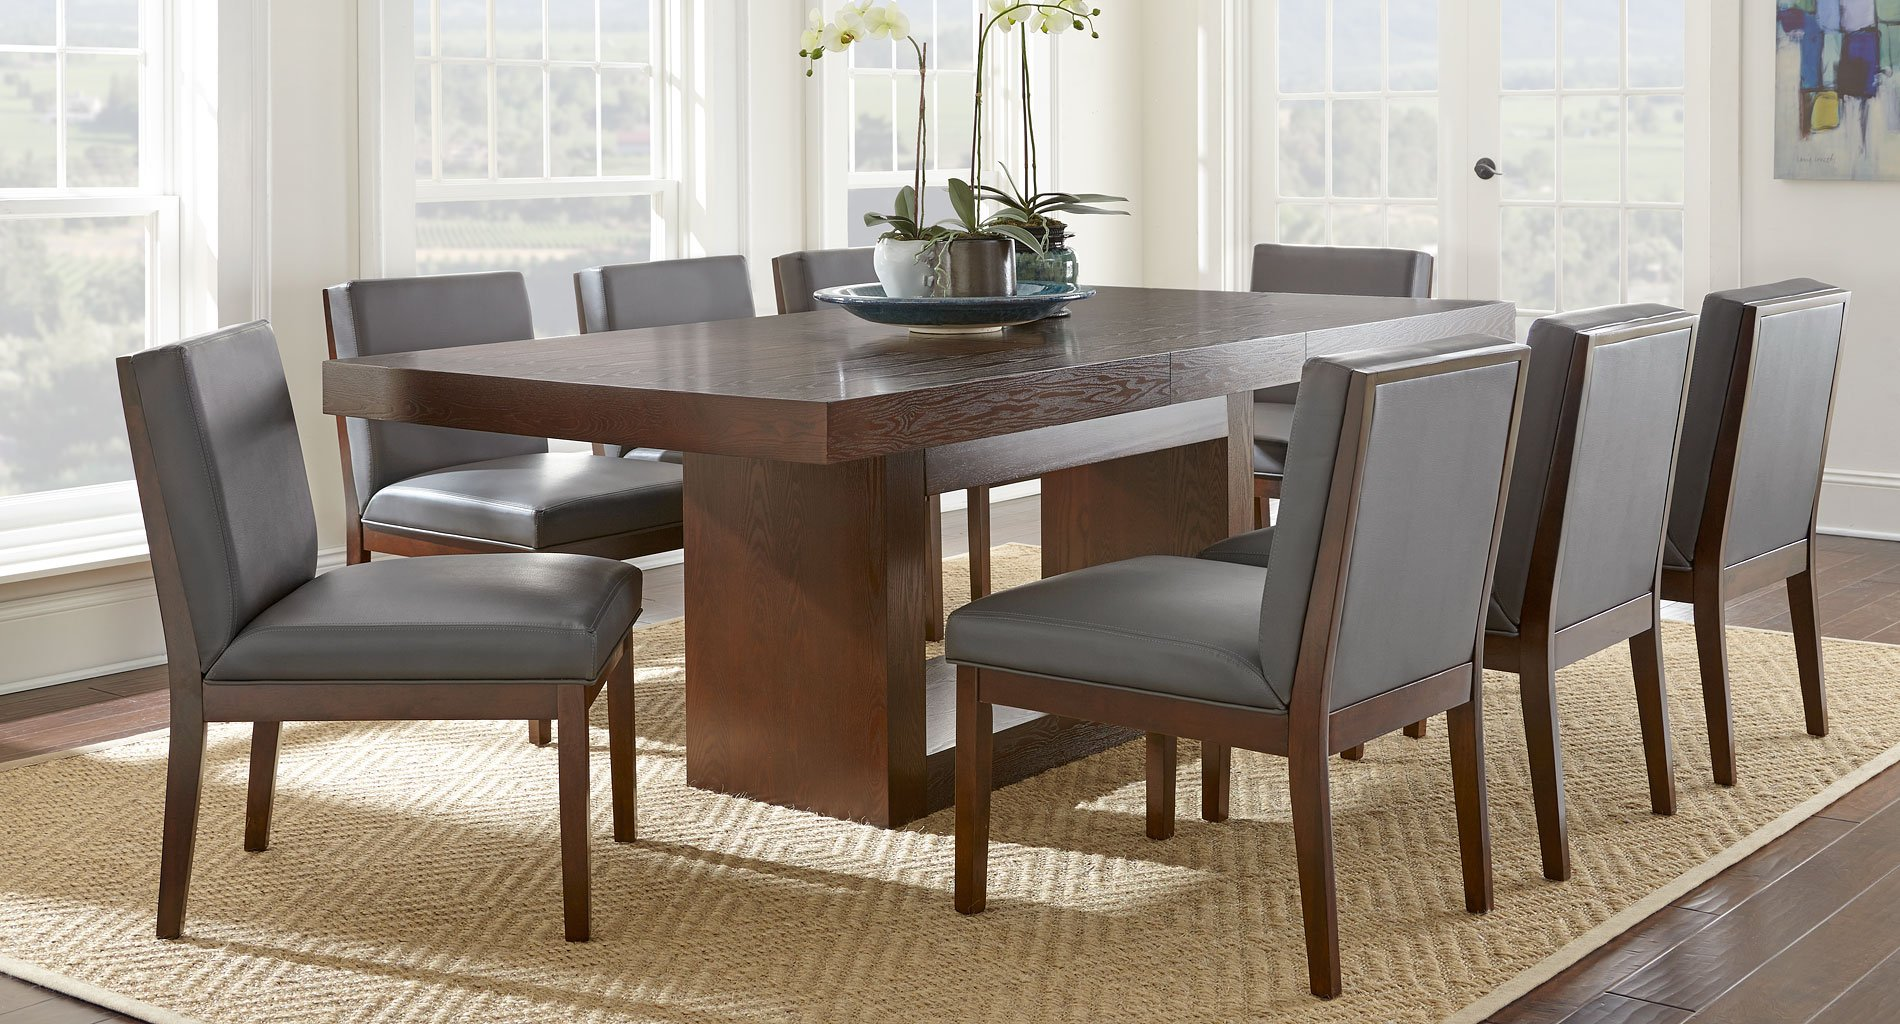 antonio dining room set w emma gray chairs steve silver furniture rh furniturecart com Emma and Ellie's Room Emma's Room Signs